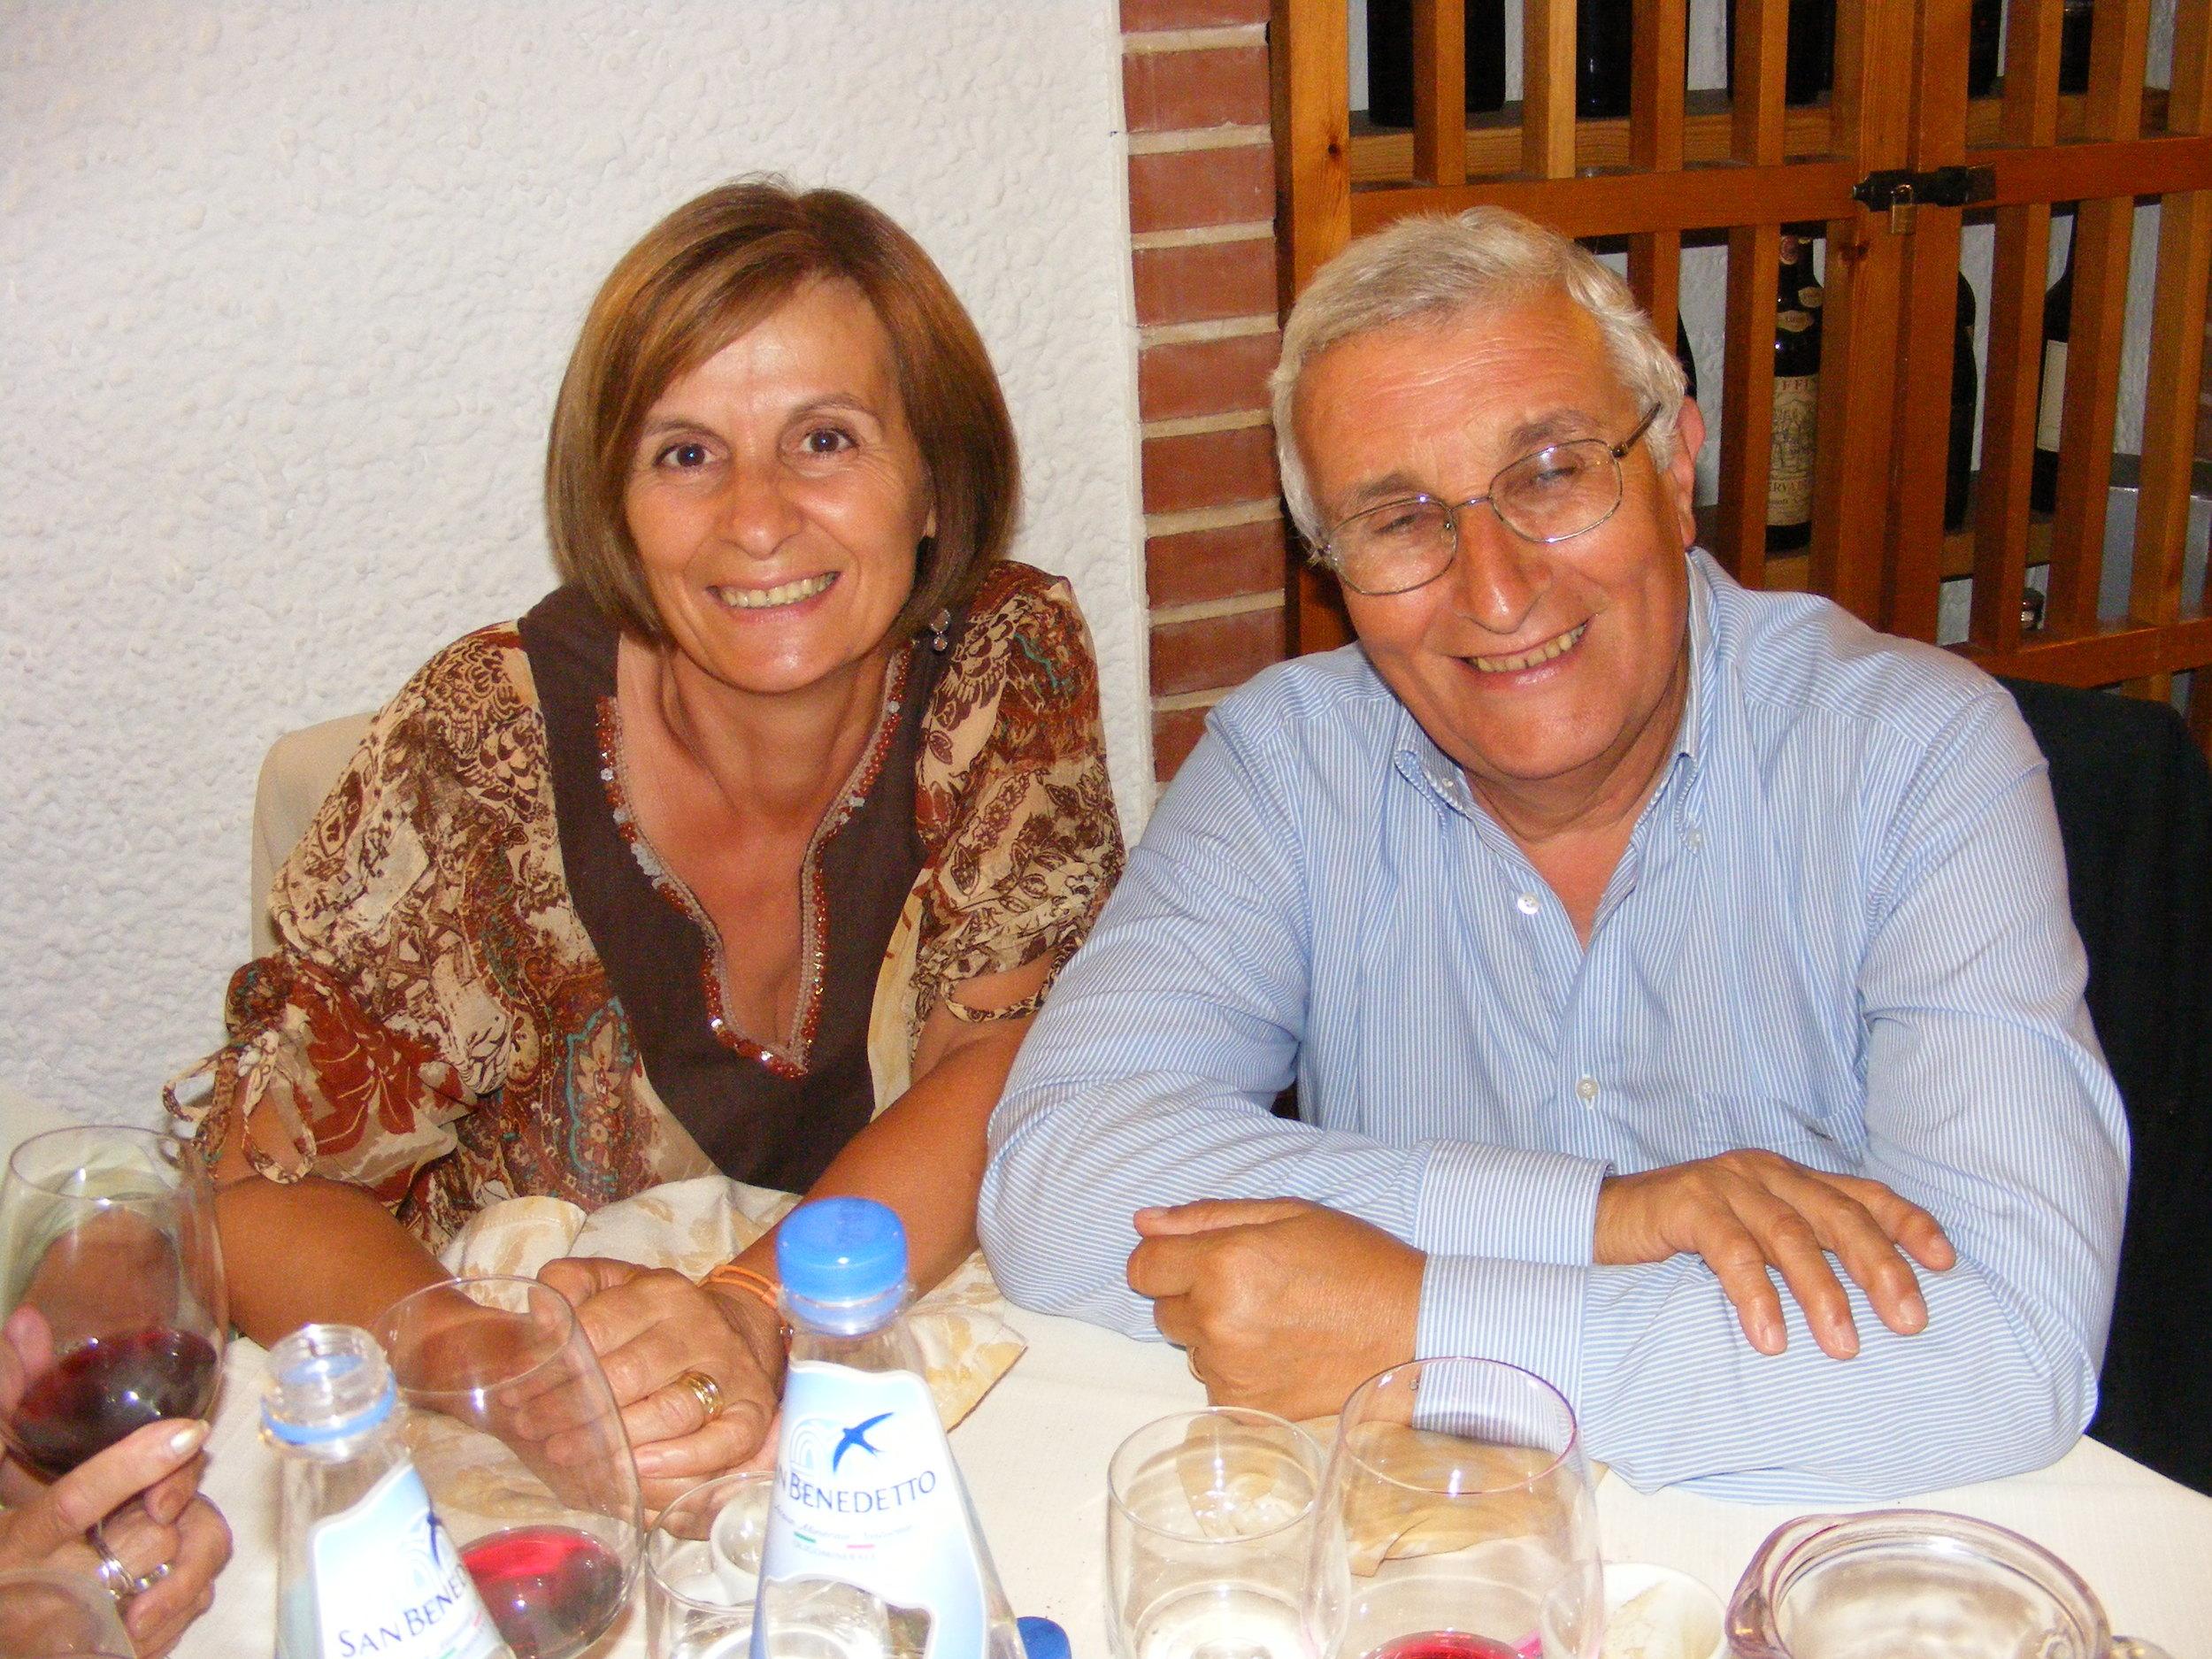 Lidia and Aldo